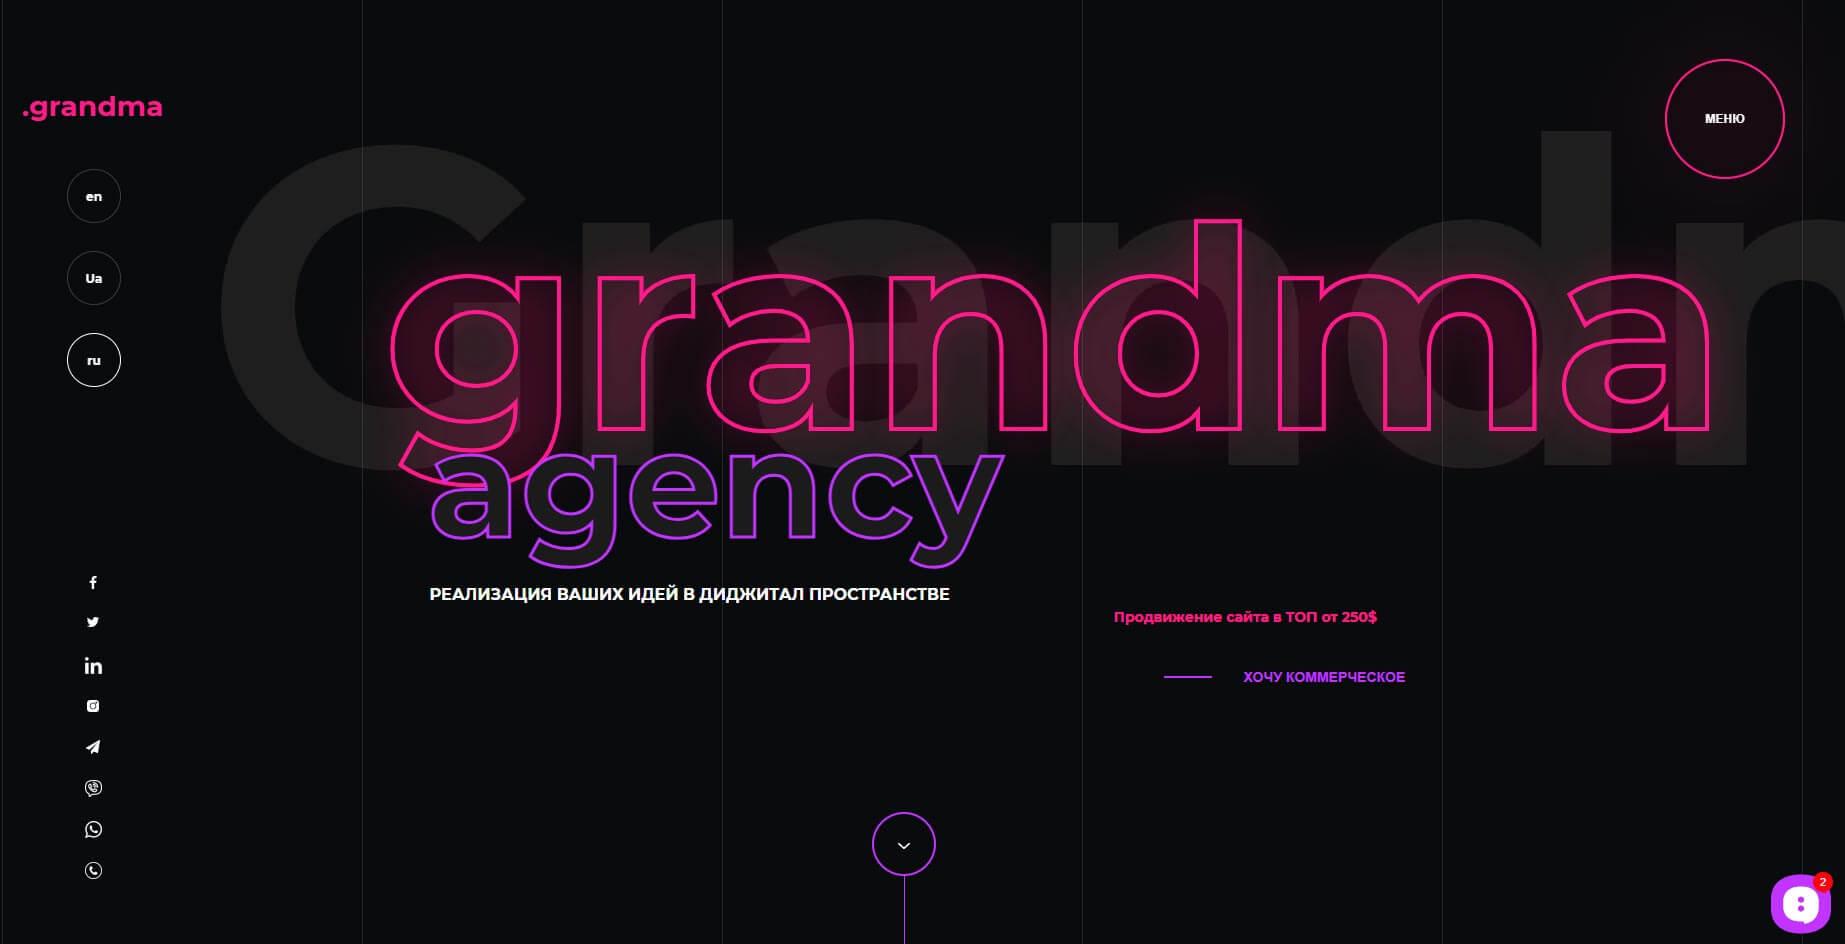 GRANDMA AGENCY - обзор компании, услуги, отзывы, клиенты | Google SEO, Фото № 1 - google-seo.pro